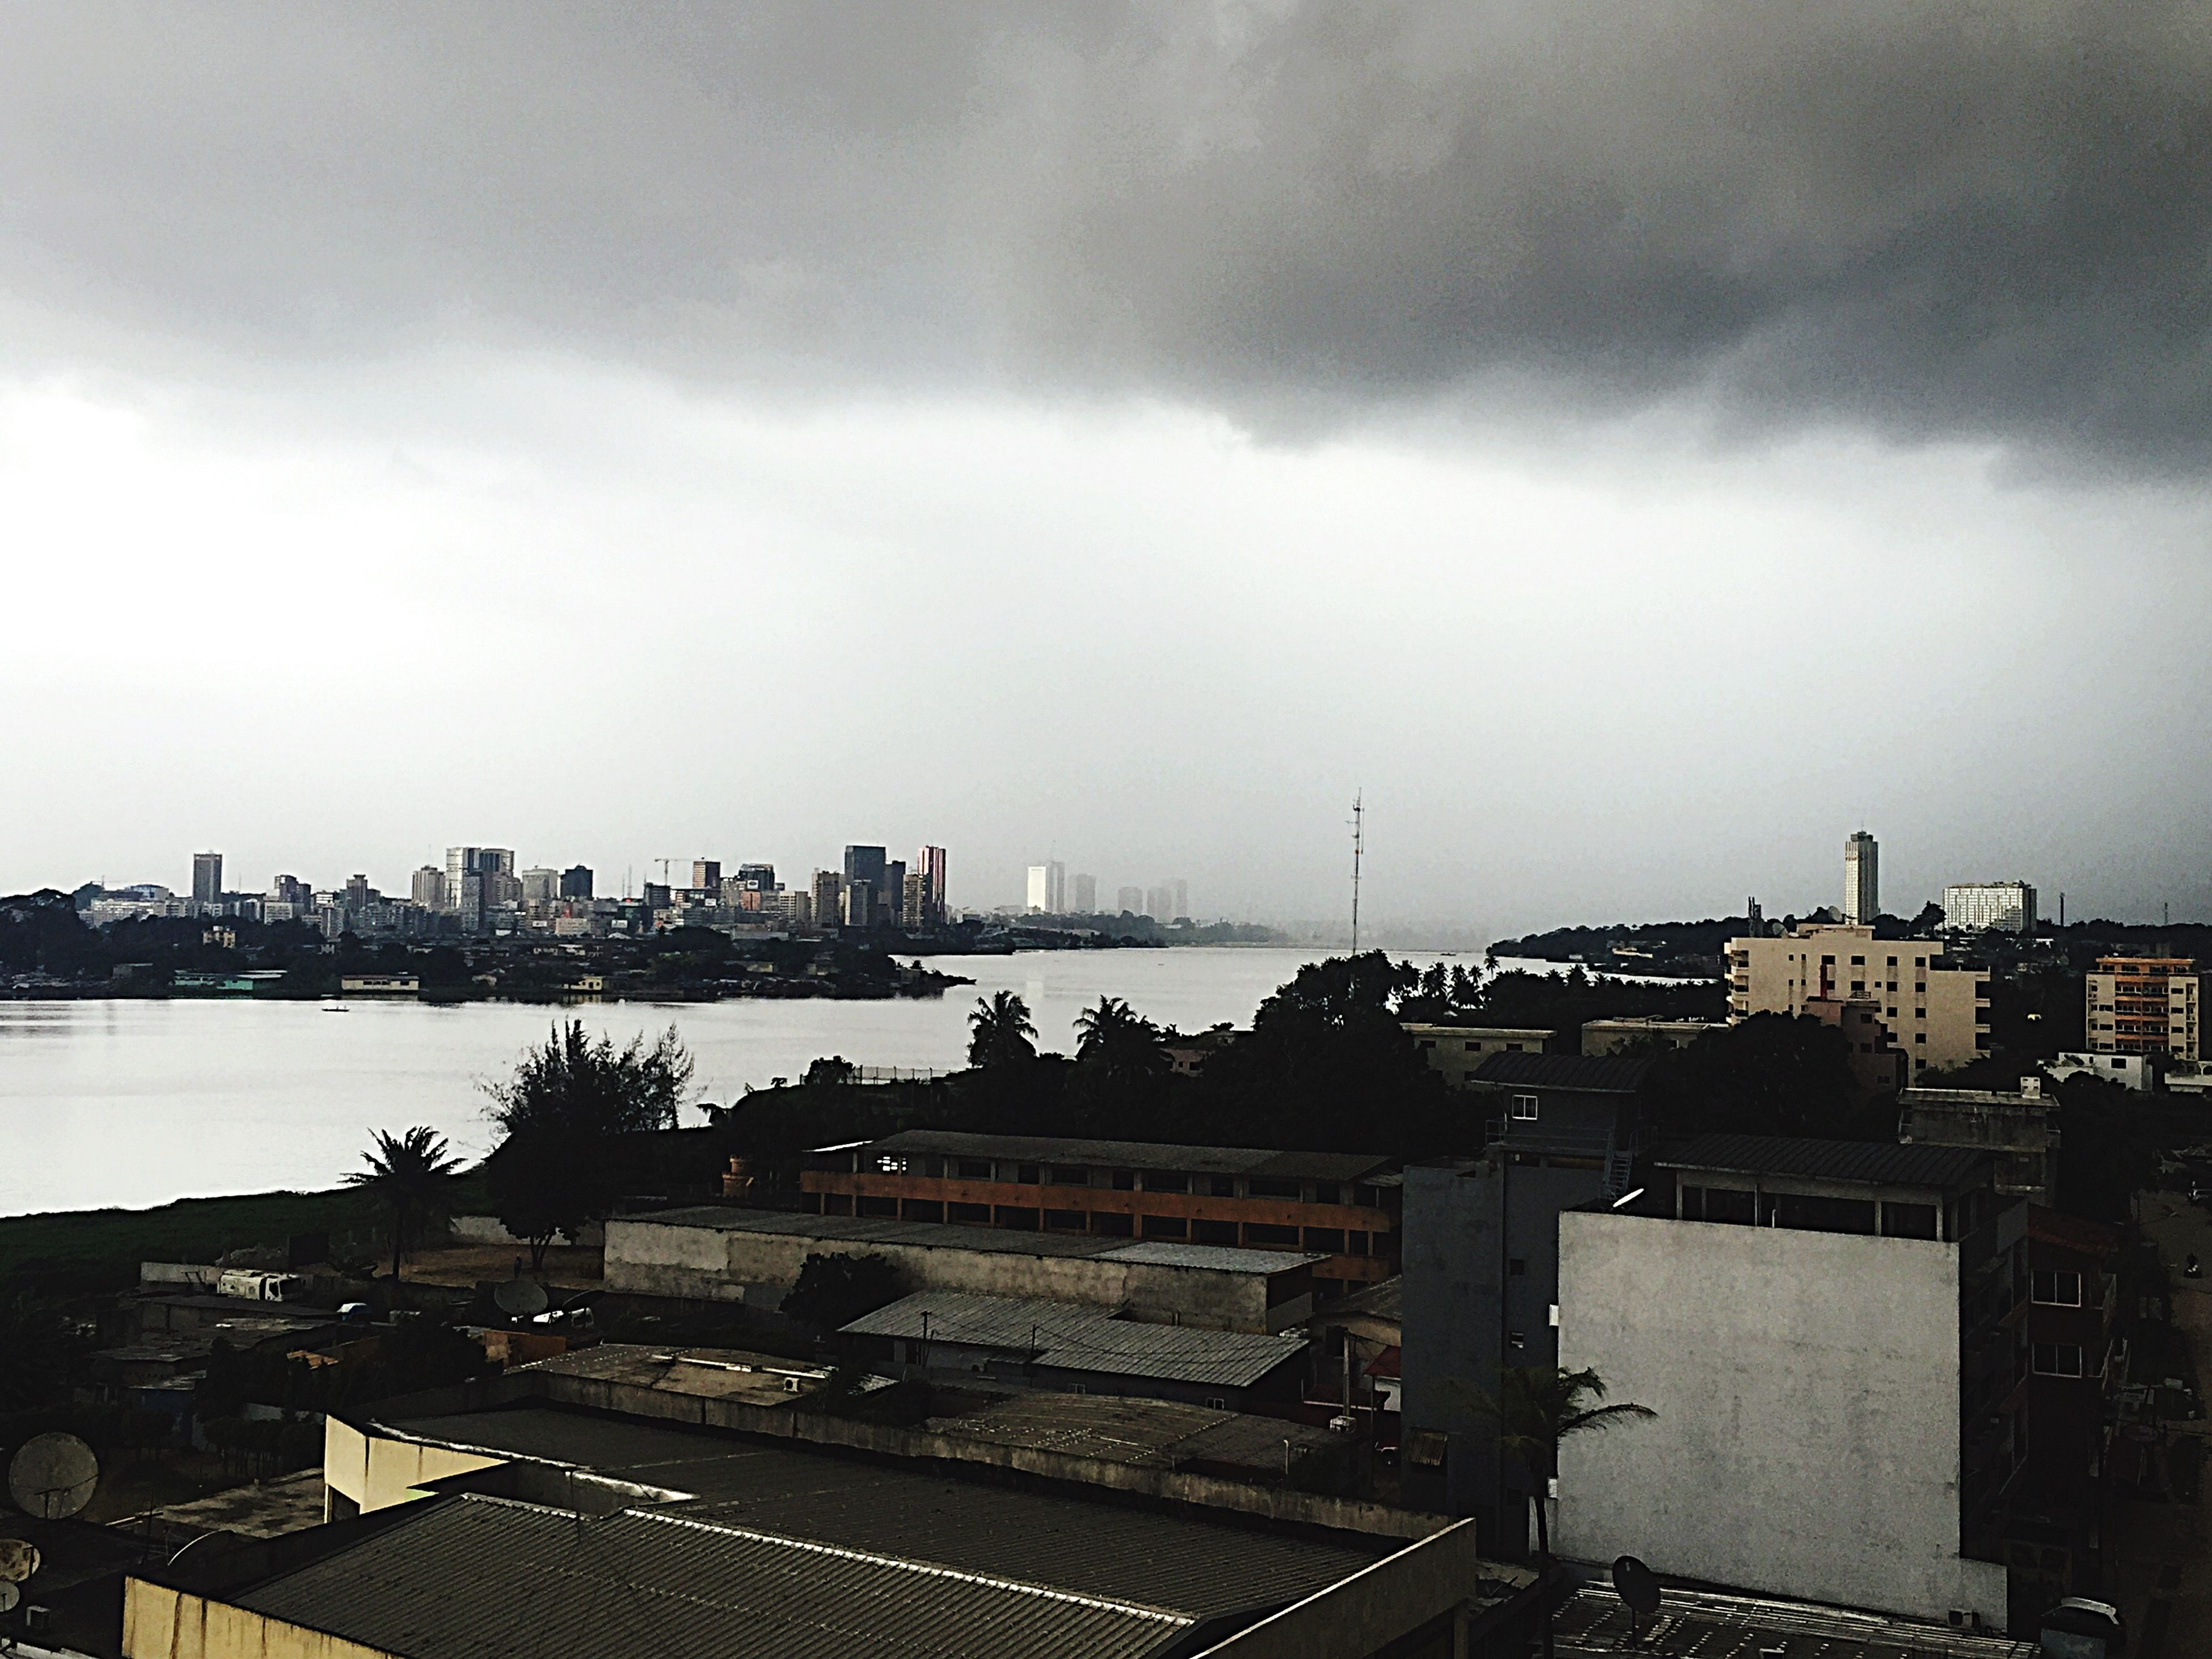 Storm Battle Of Cities Plateau Business Center Petitnewyork Perledeslagunes Cotedivoire